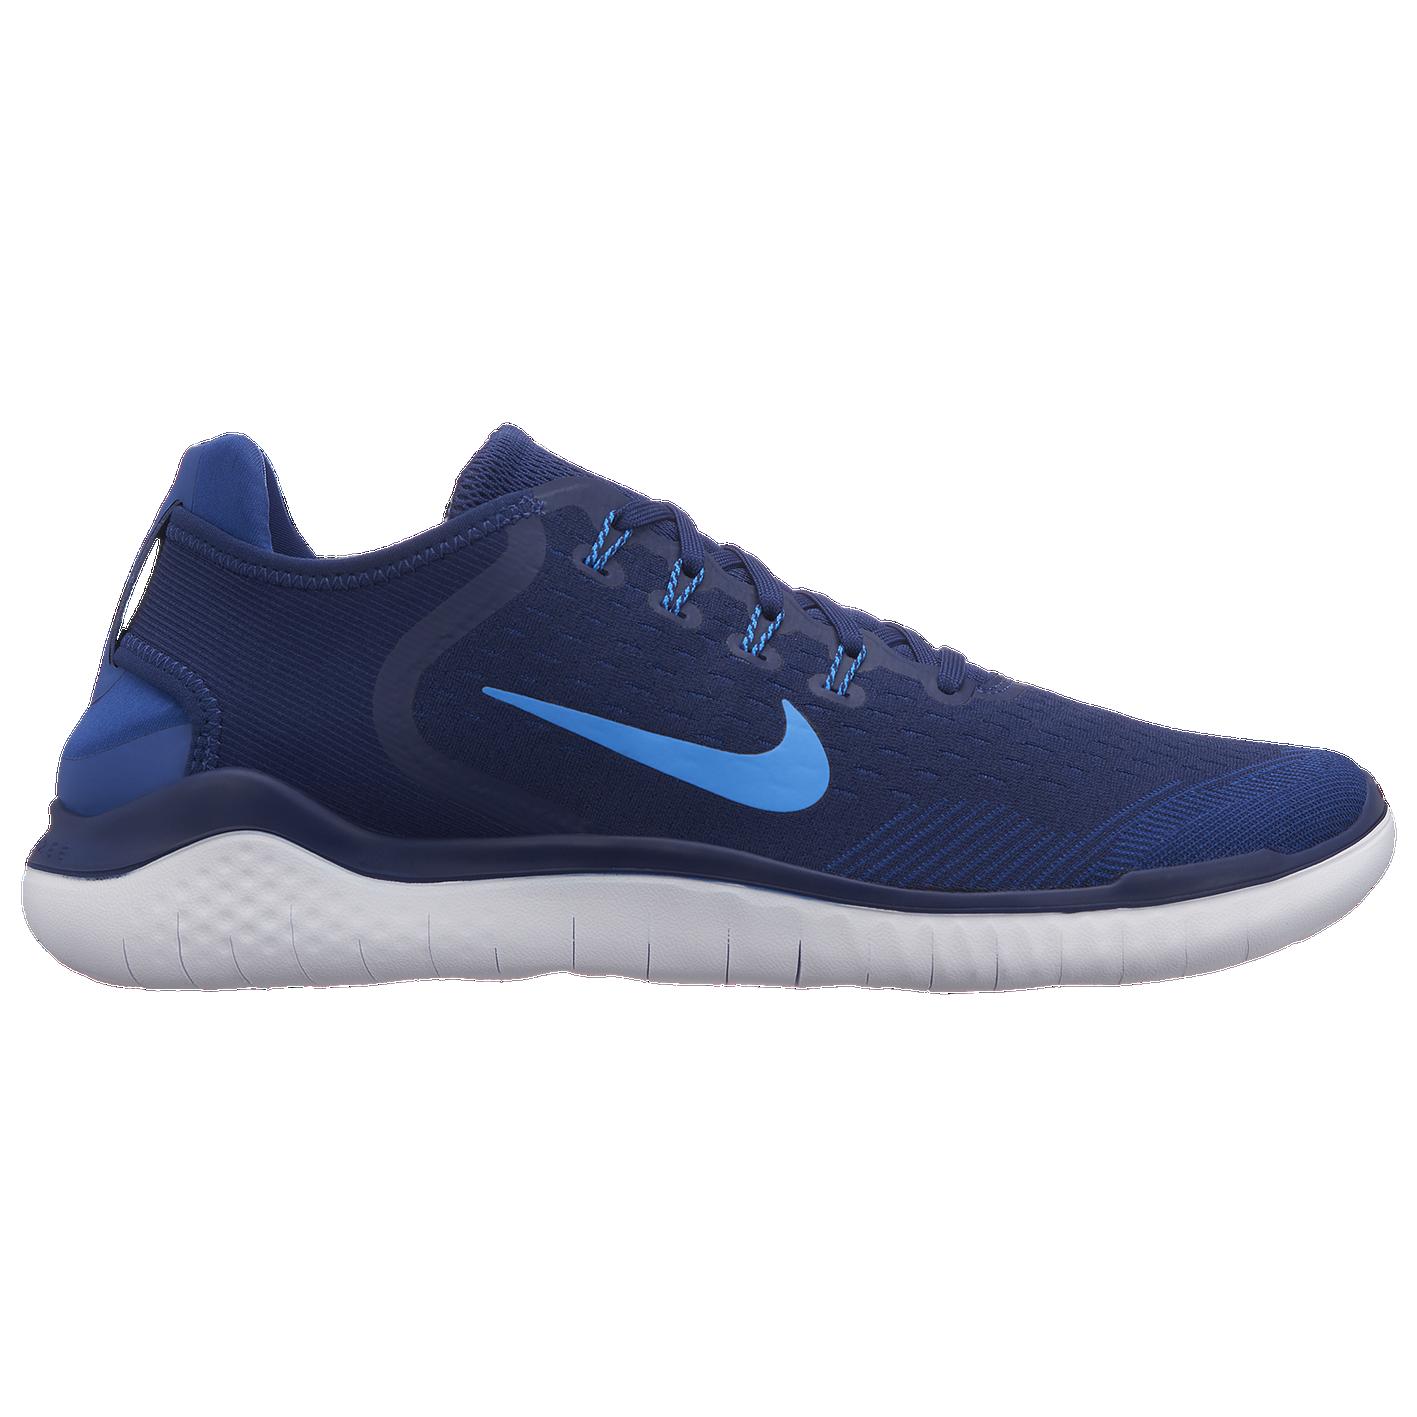 79029b17b243 Nike Free RN 2018 - Men s - Running - Shoes - Blue Void Photo Blue ...